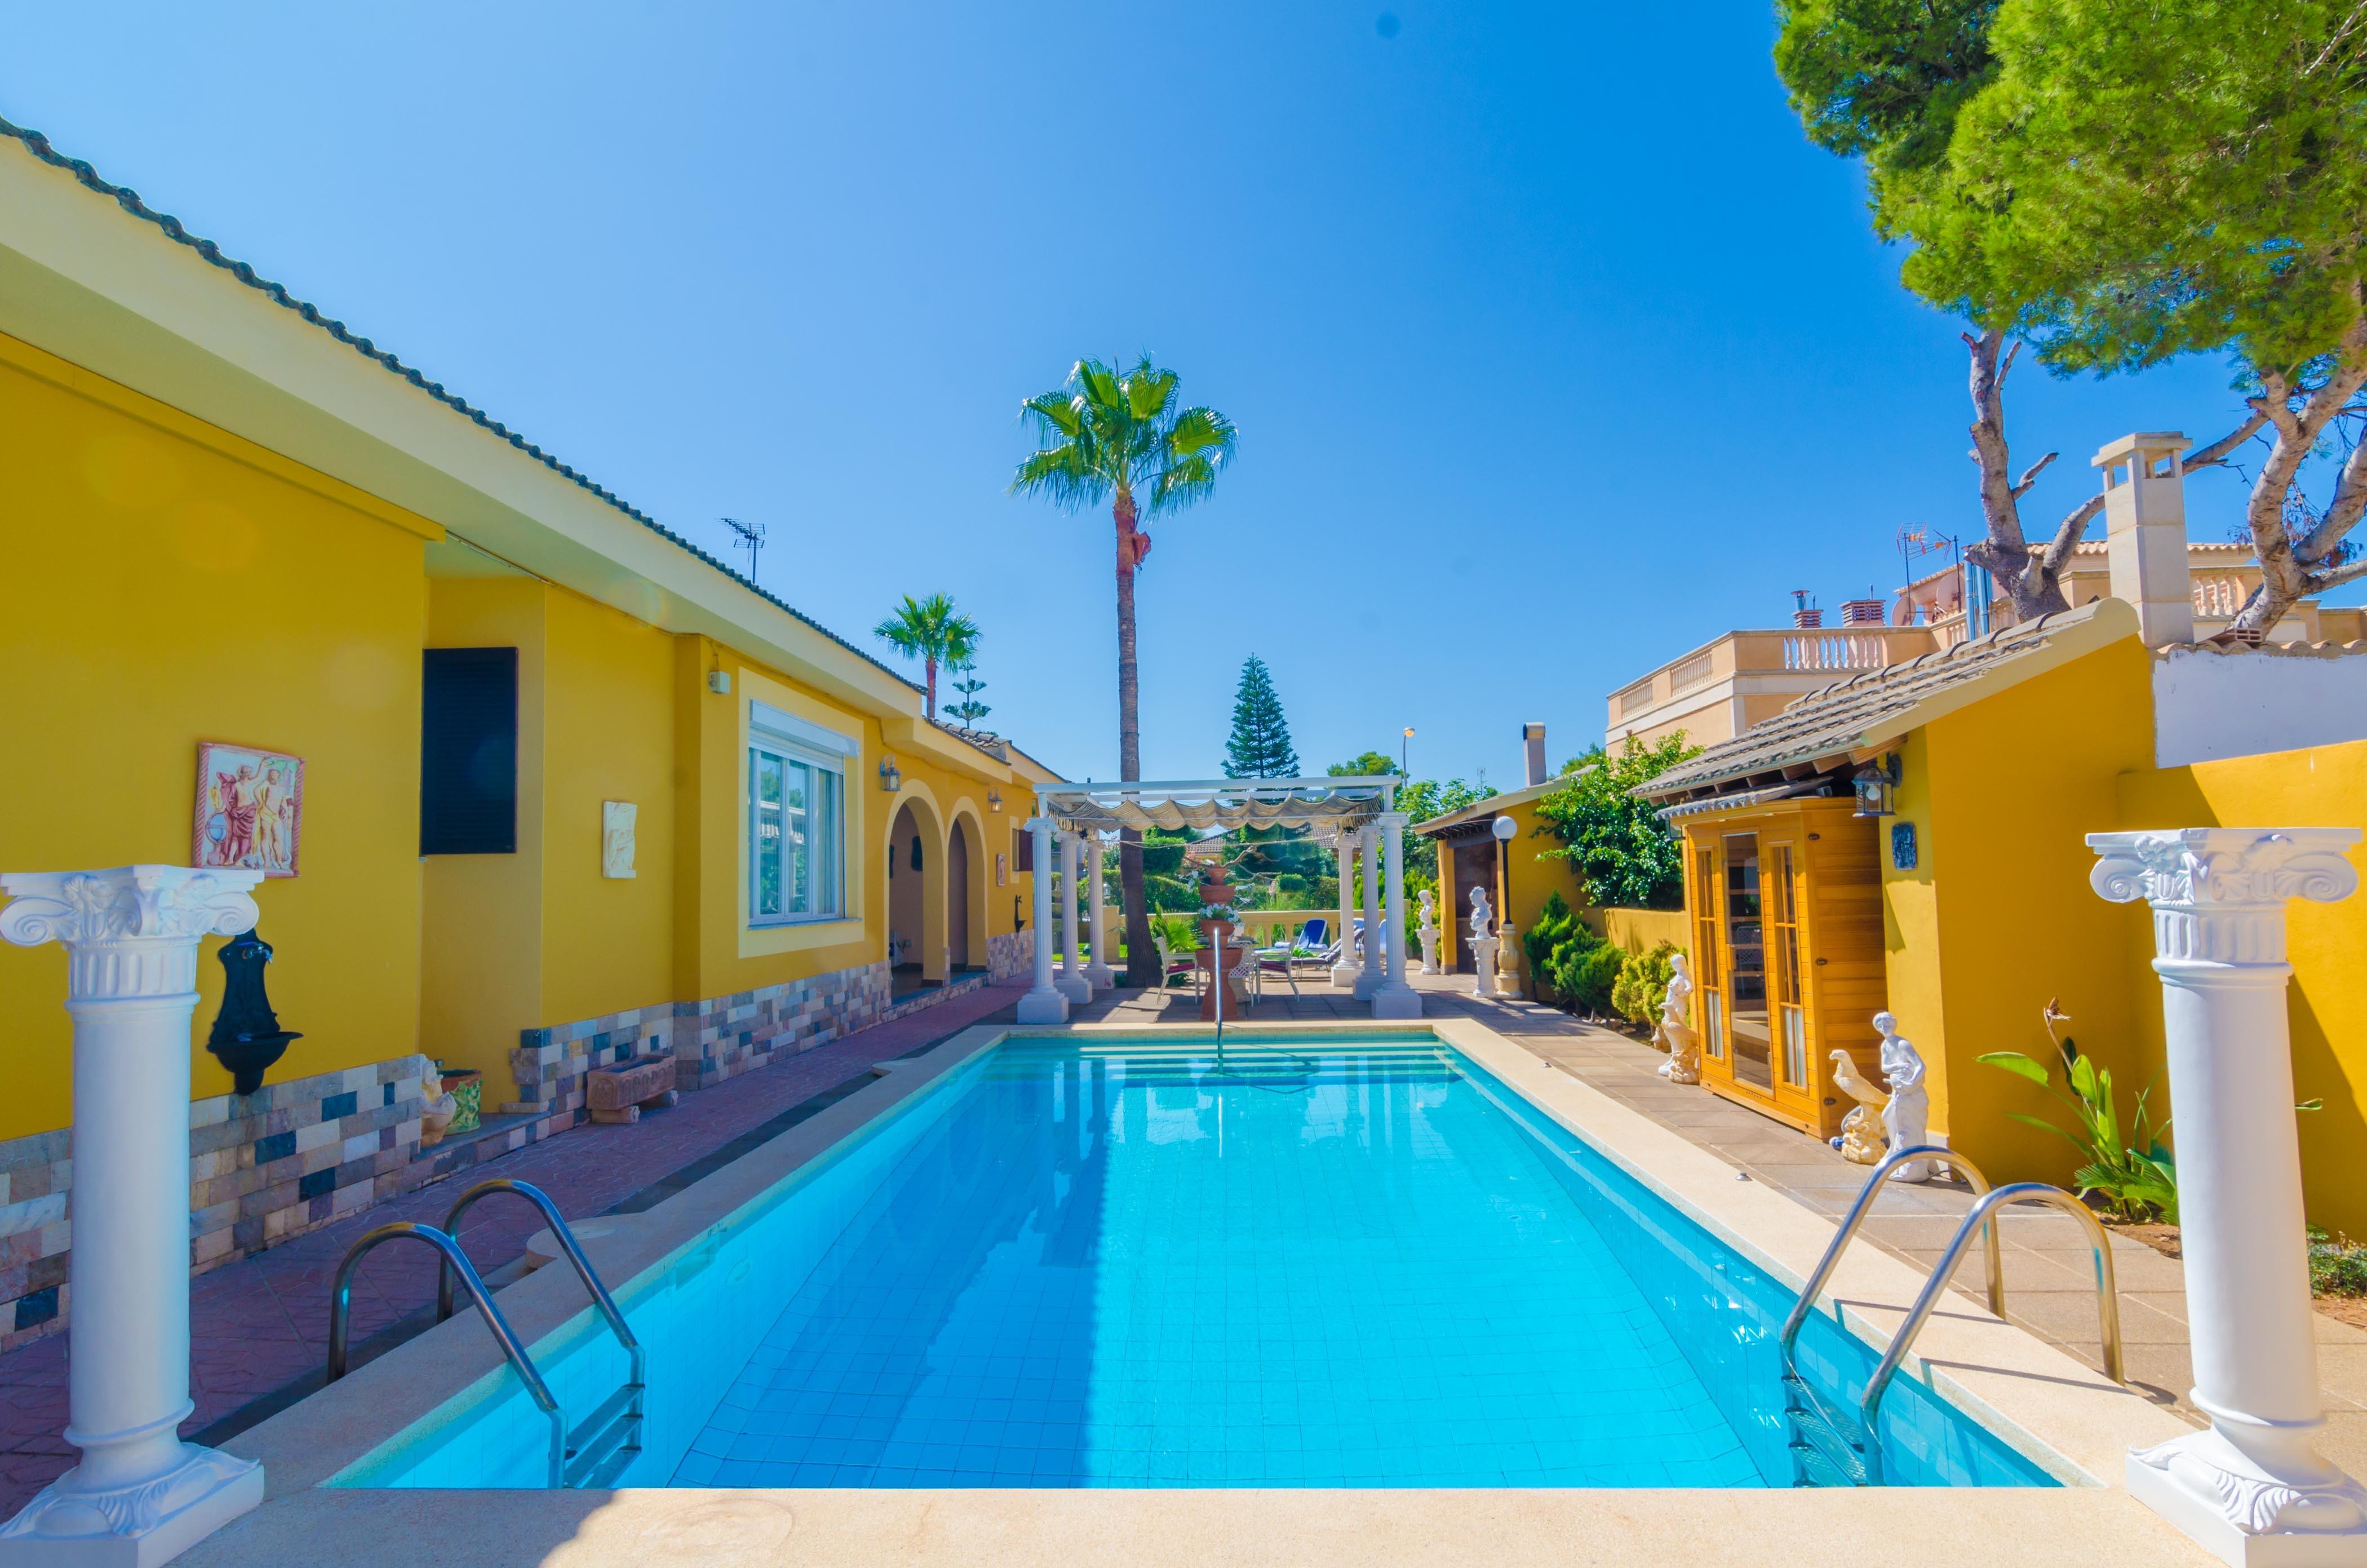 Ferienhaus CAN GORI (2296828), Badia Gran, Mallorca, Balearische Inseln, Spanien, Bild 2